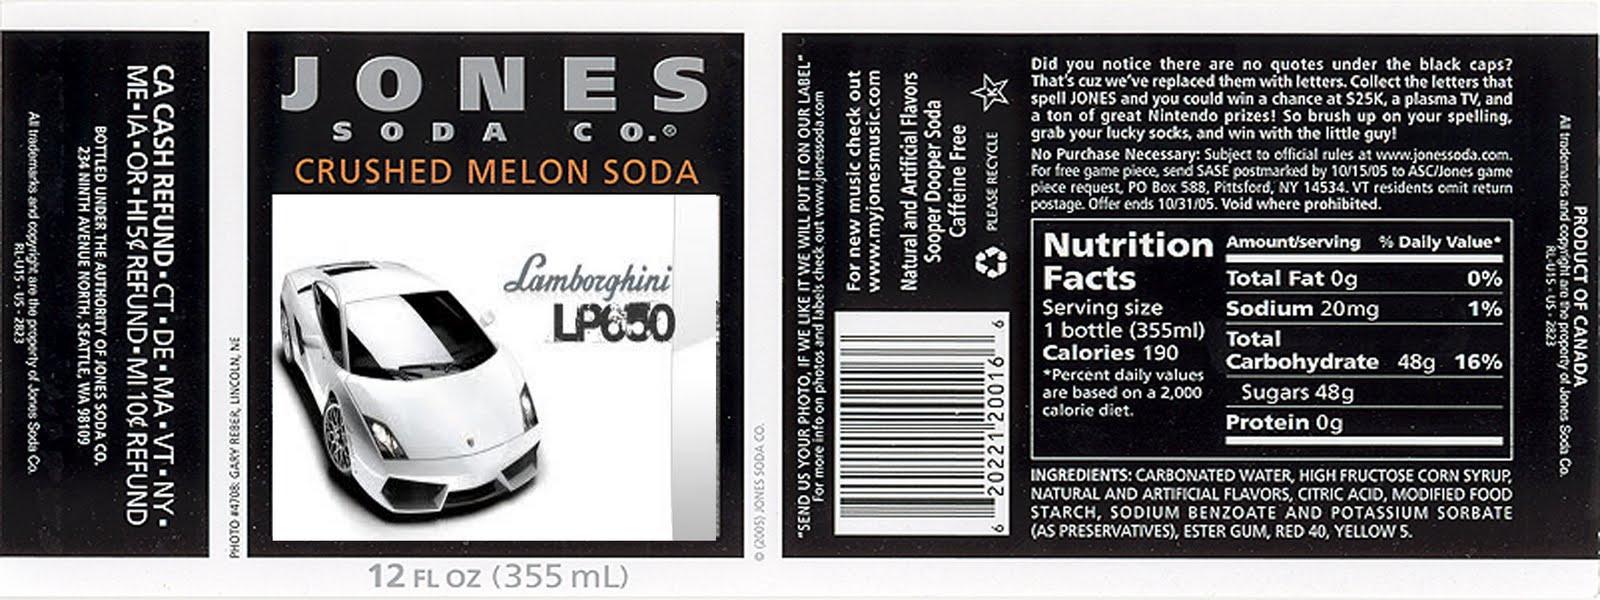 jonesing for a template: DIY soda bottle labels Kimberly